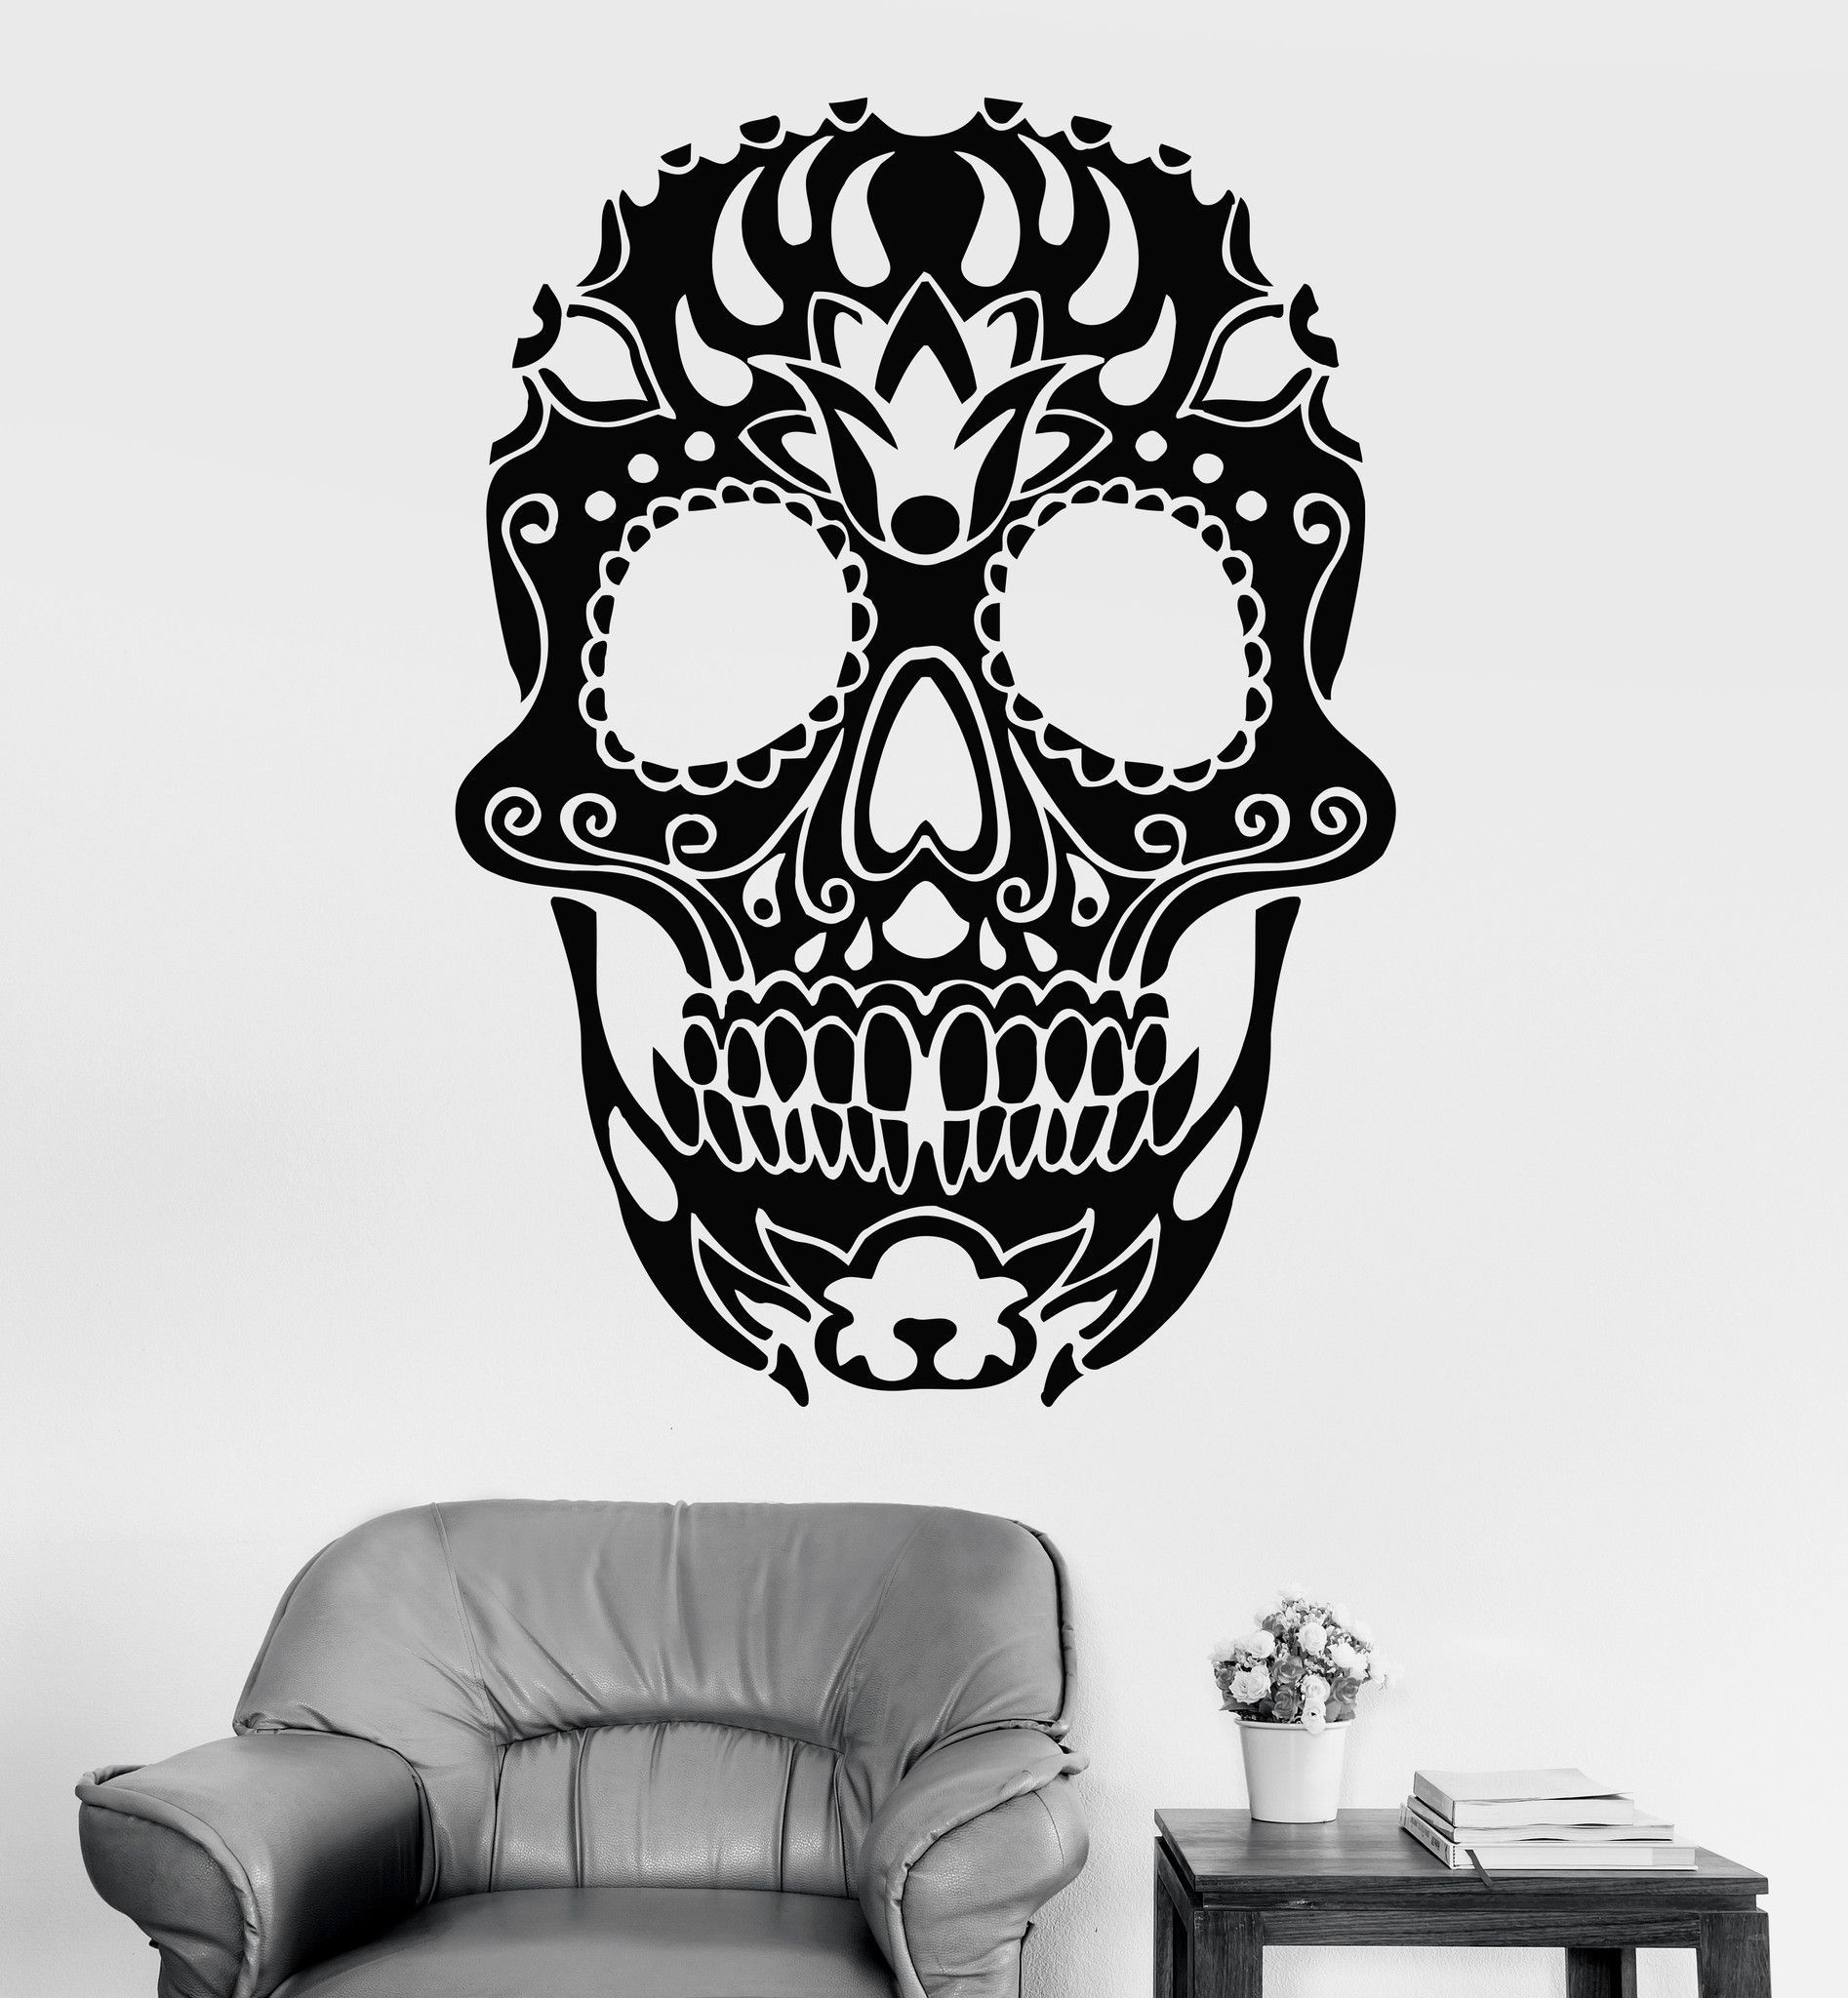 vinyl wall stickers sugar skull calavera mexico mural 163ig vinyl wall stickers sugar skull calavera mexico mural 163ig